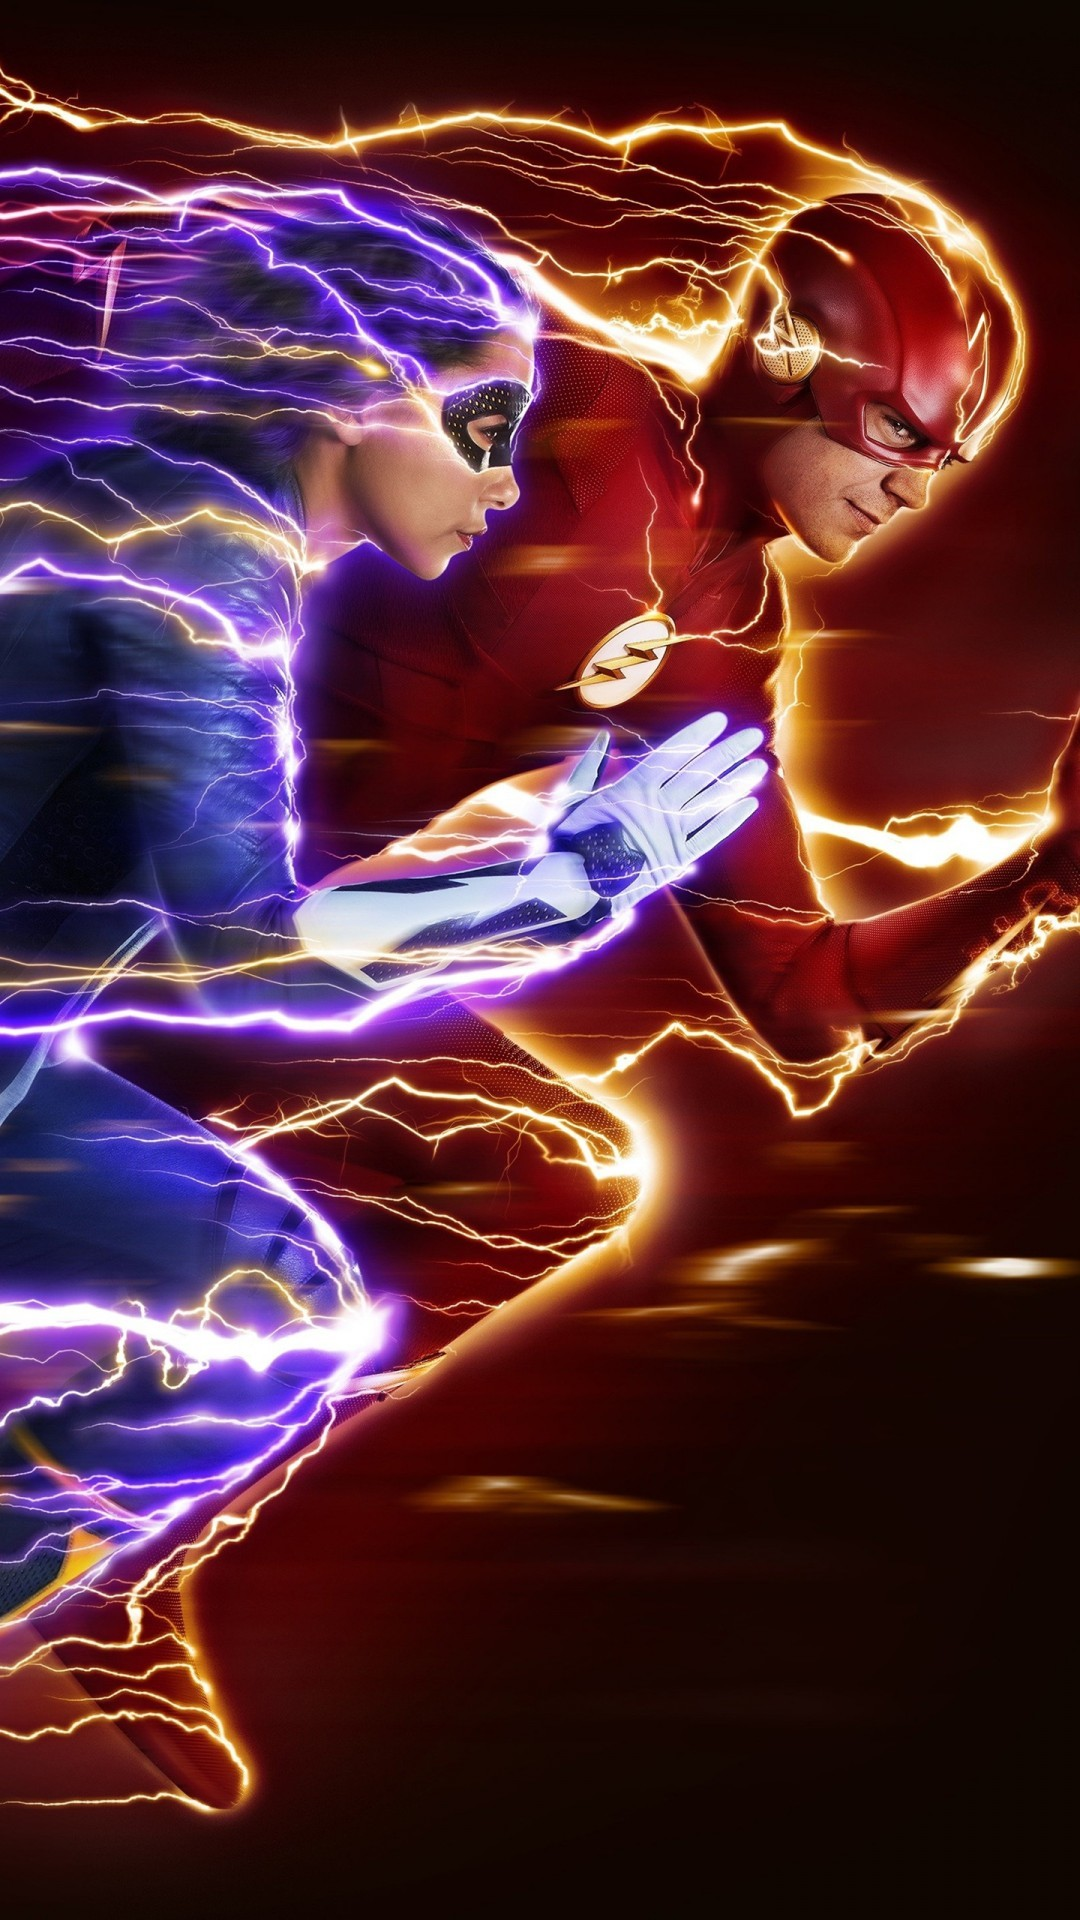 Free The Flash Nora Season 5 phone wallpaper by hoad01